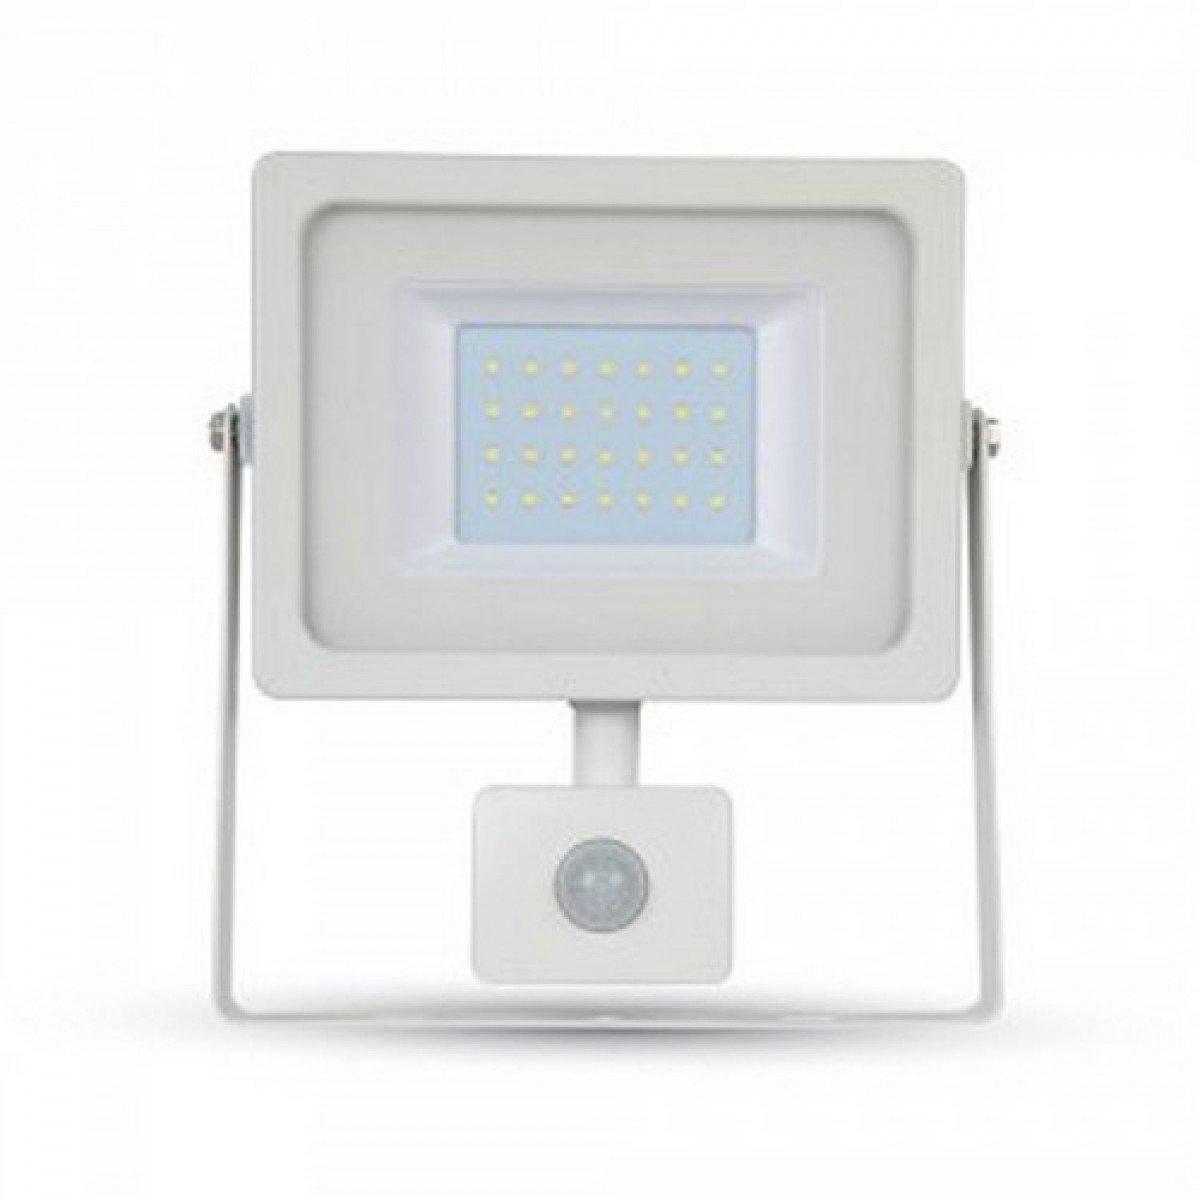 Faro LED 30 W 2550lm 100 ° V-TAC aluminio Ultra Fina Slim Blanco Sensor PIR + crepuscular IP44 vt-4933 - SKU 5824 blanco frío 6400 K: Amazon.es: Iluminación